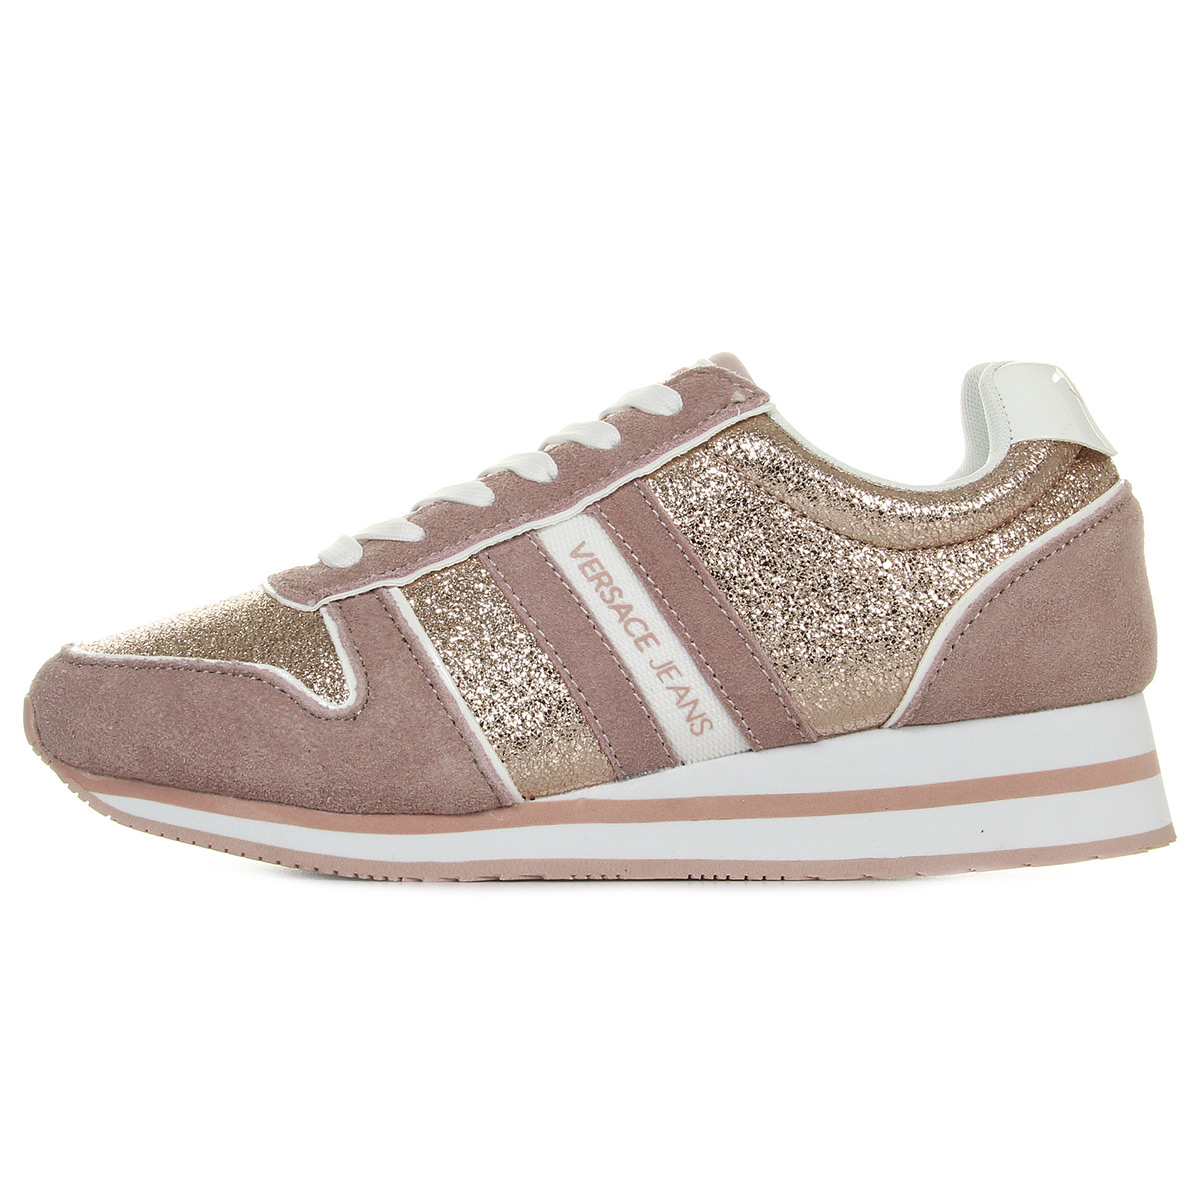 Versace Jeans Linea Fondo Stella Dis1 Suede Coated Shiny Textile E0VRBSA170027521, Baskets mode femme